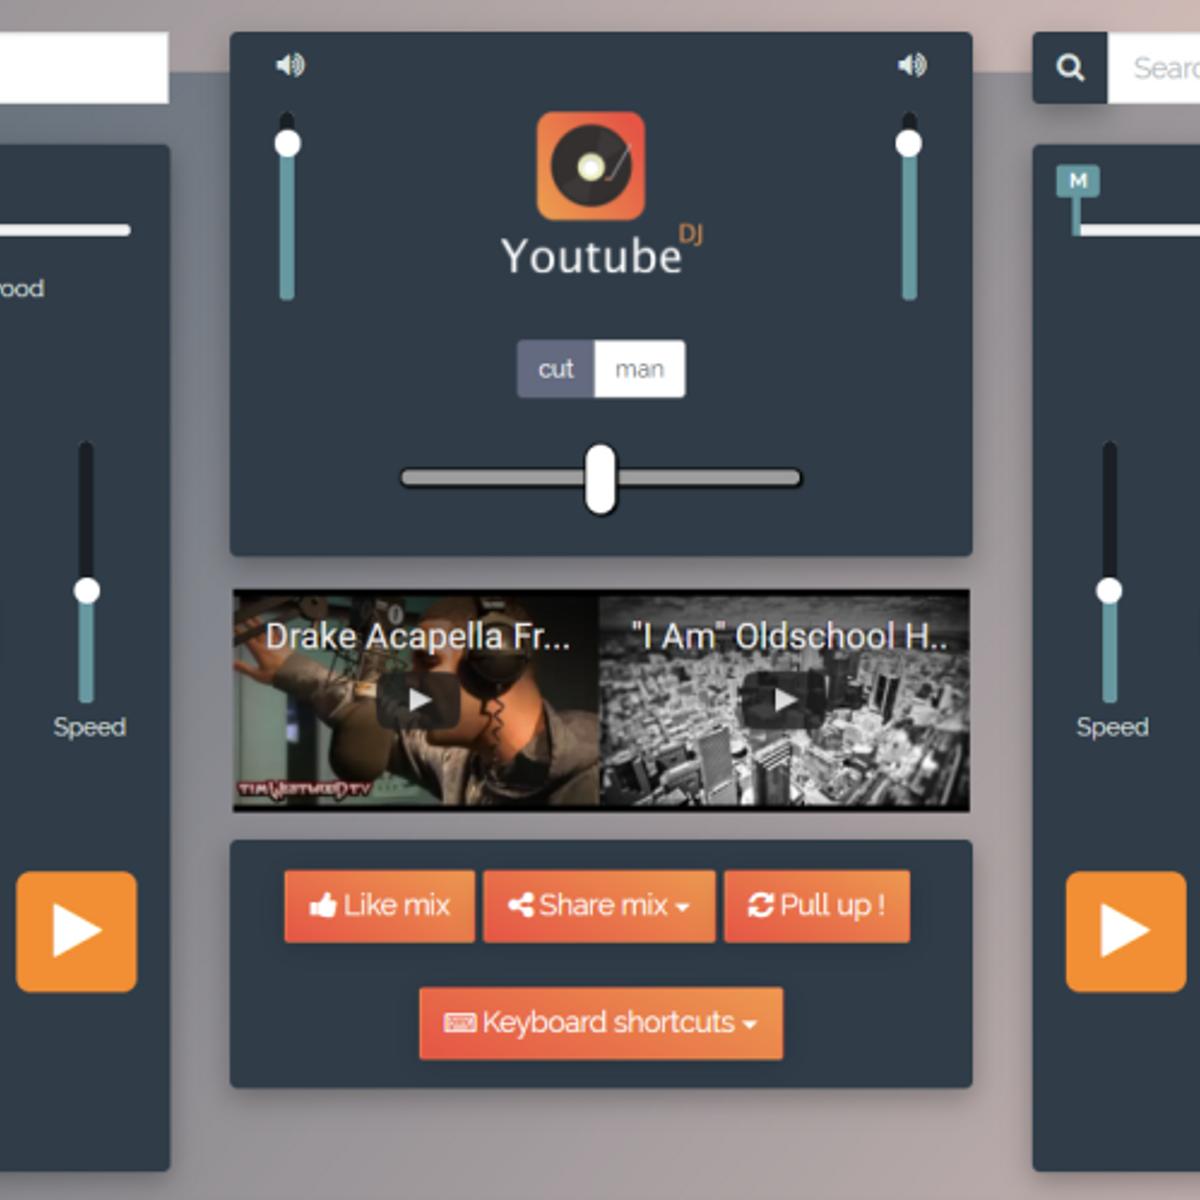 Youtube-DJ Alternatives and Similar Software - AlternativeTo net